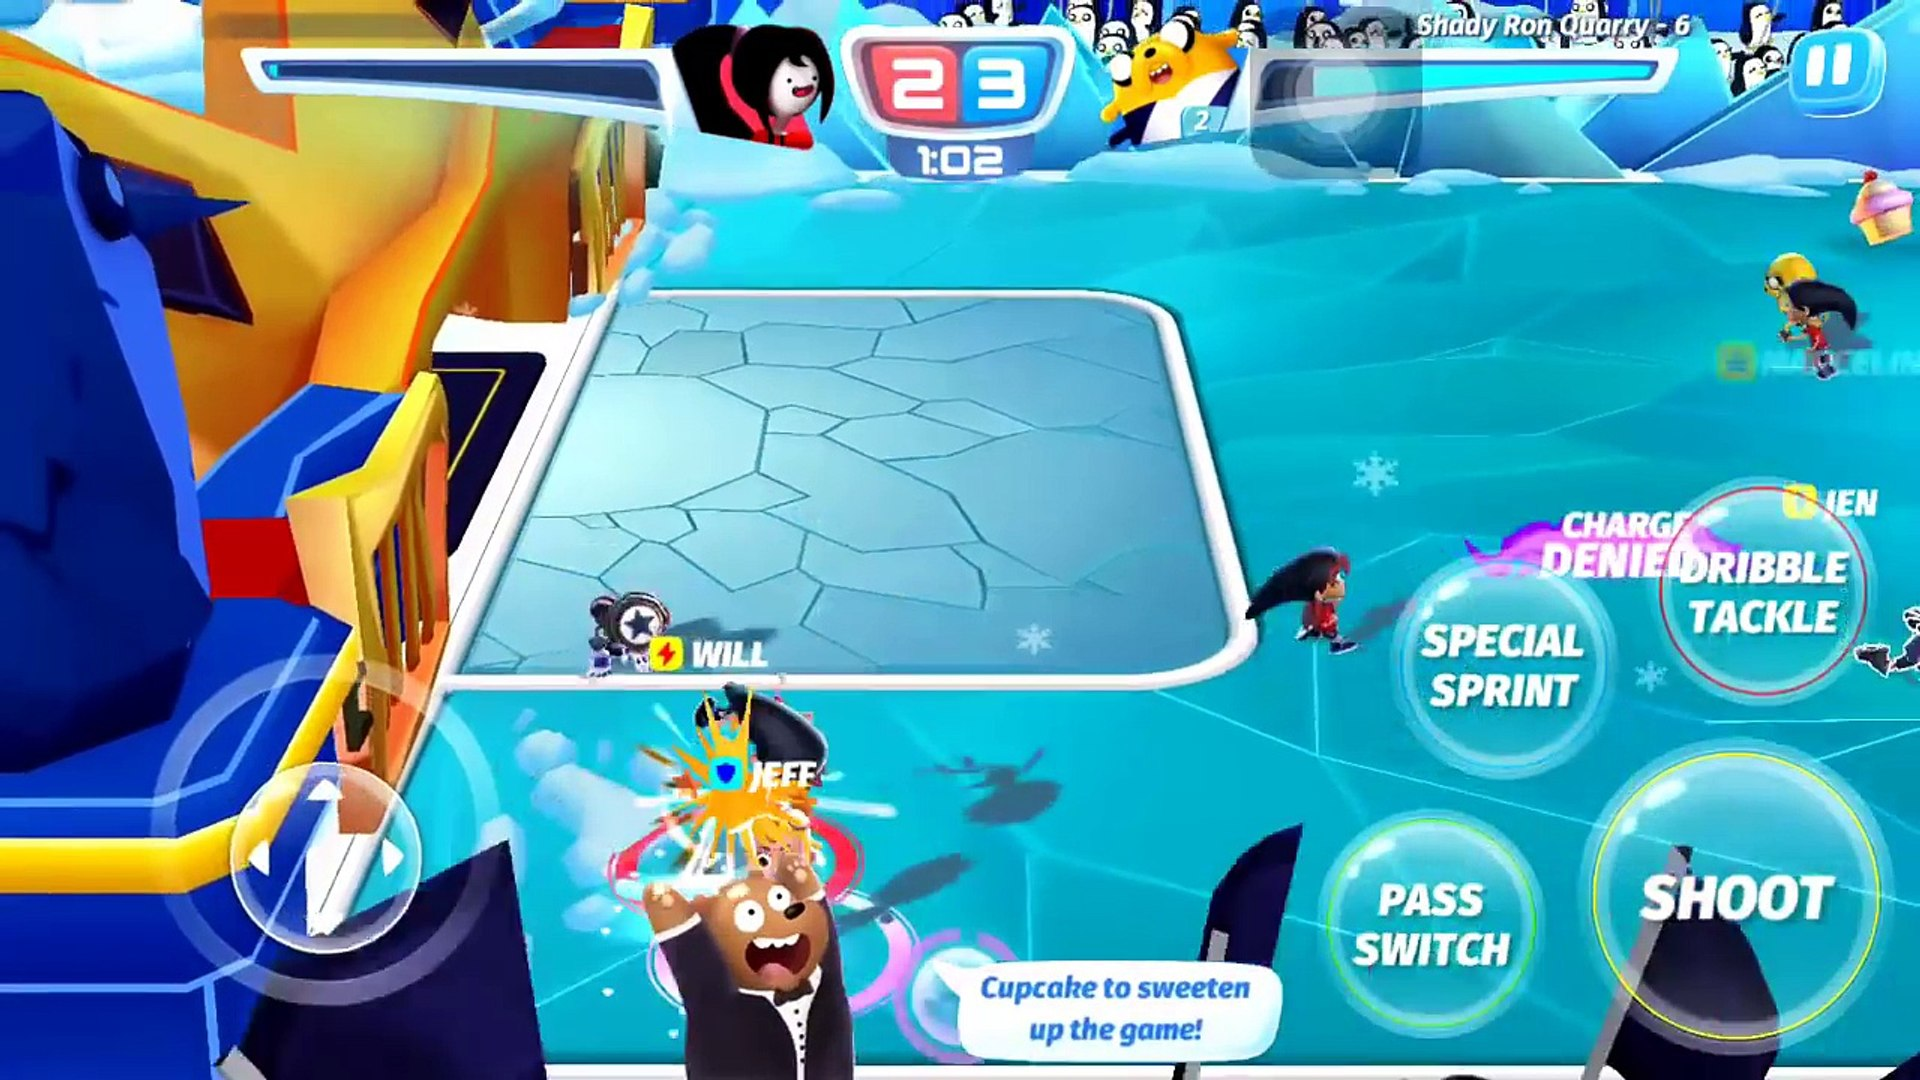 Cartoon Network Superstar Soccer Goal - JAKE TEAM - CHAMPIONSHIP BRACKETS -JAKES GOLD TROPHY